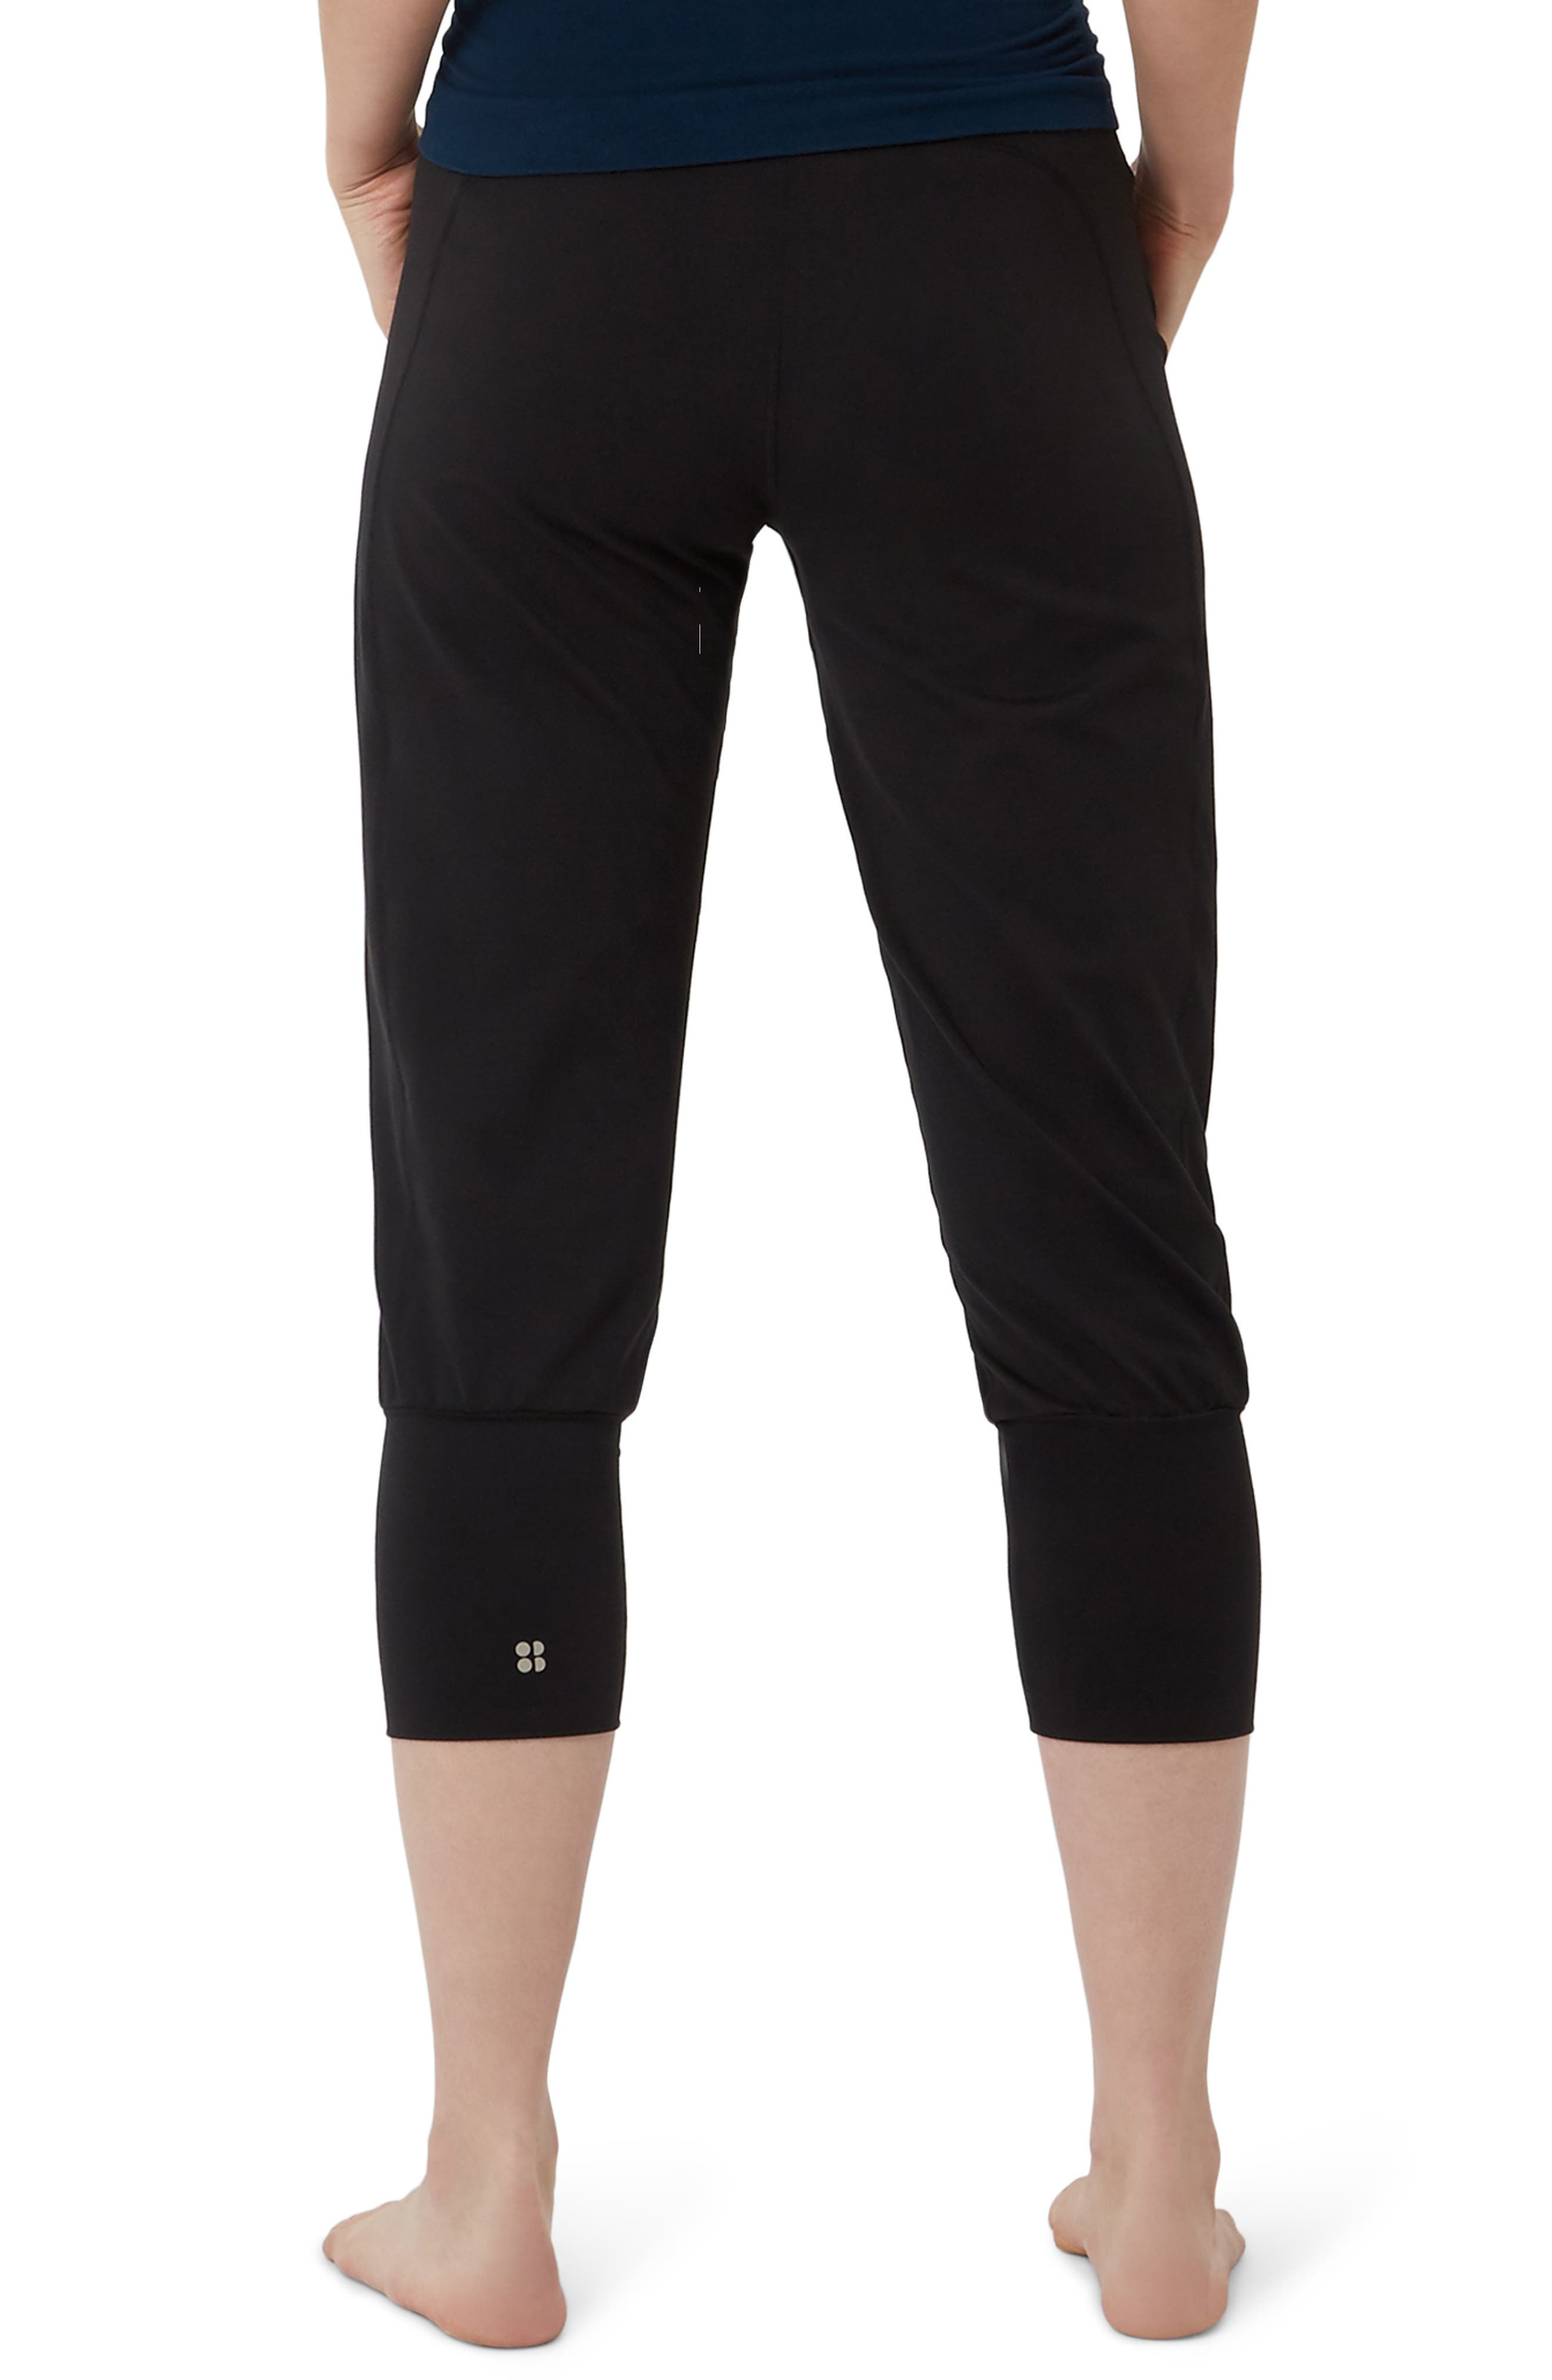 Garudasana Crop Yoga Trousers,                             Alternate thumbnail 2, color,                             BLACK